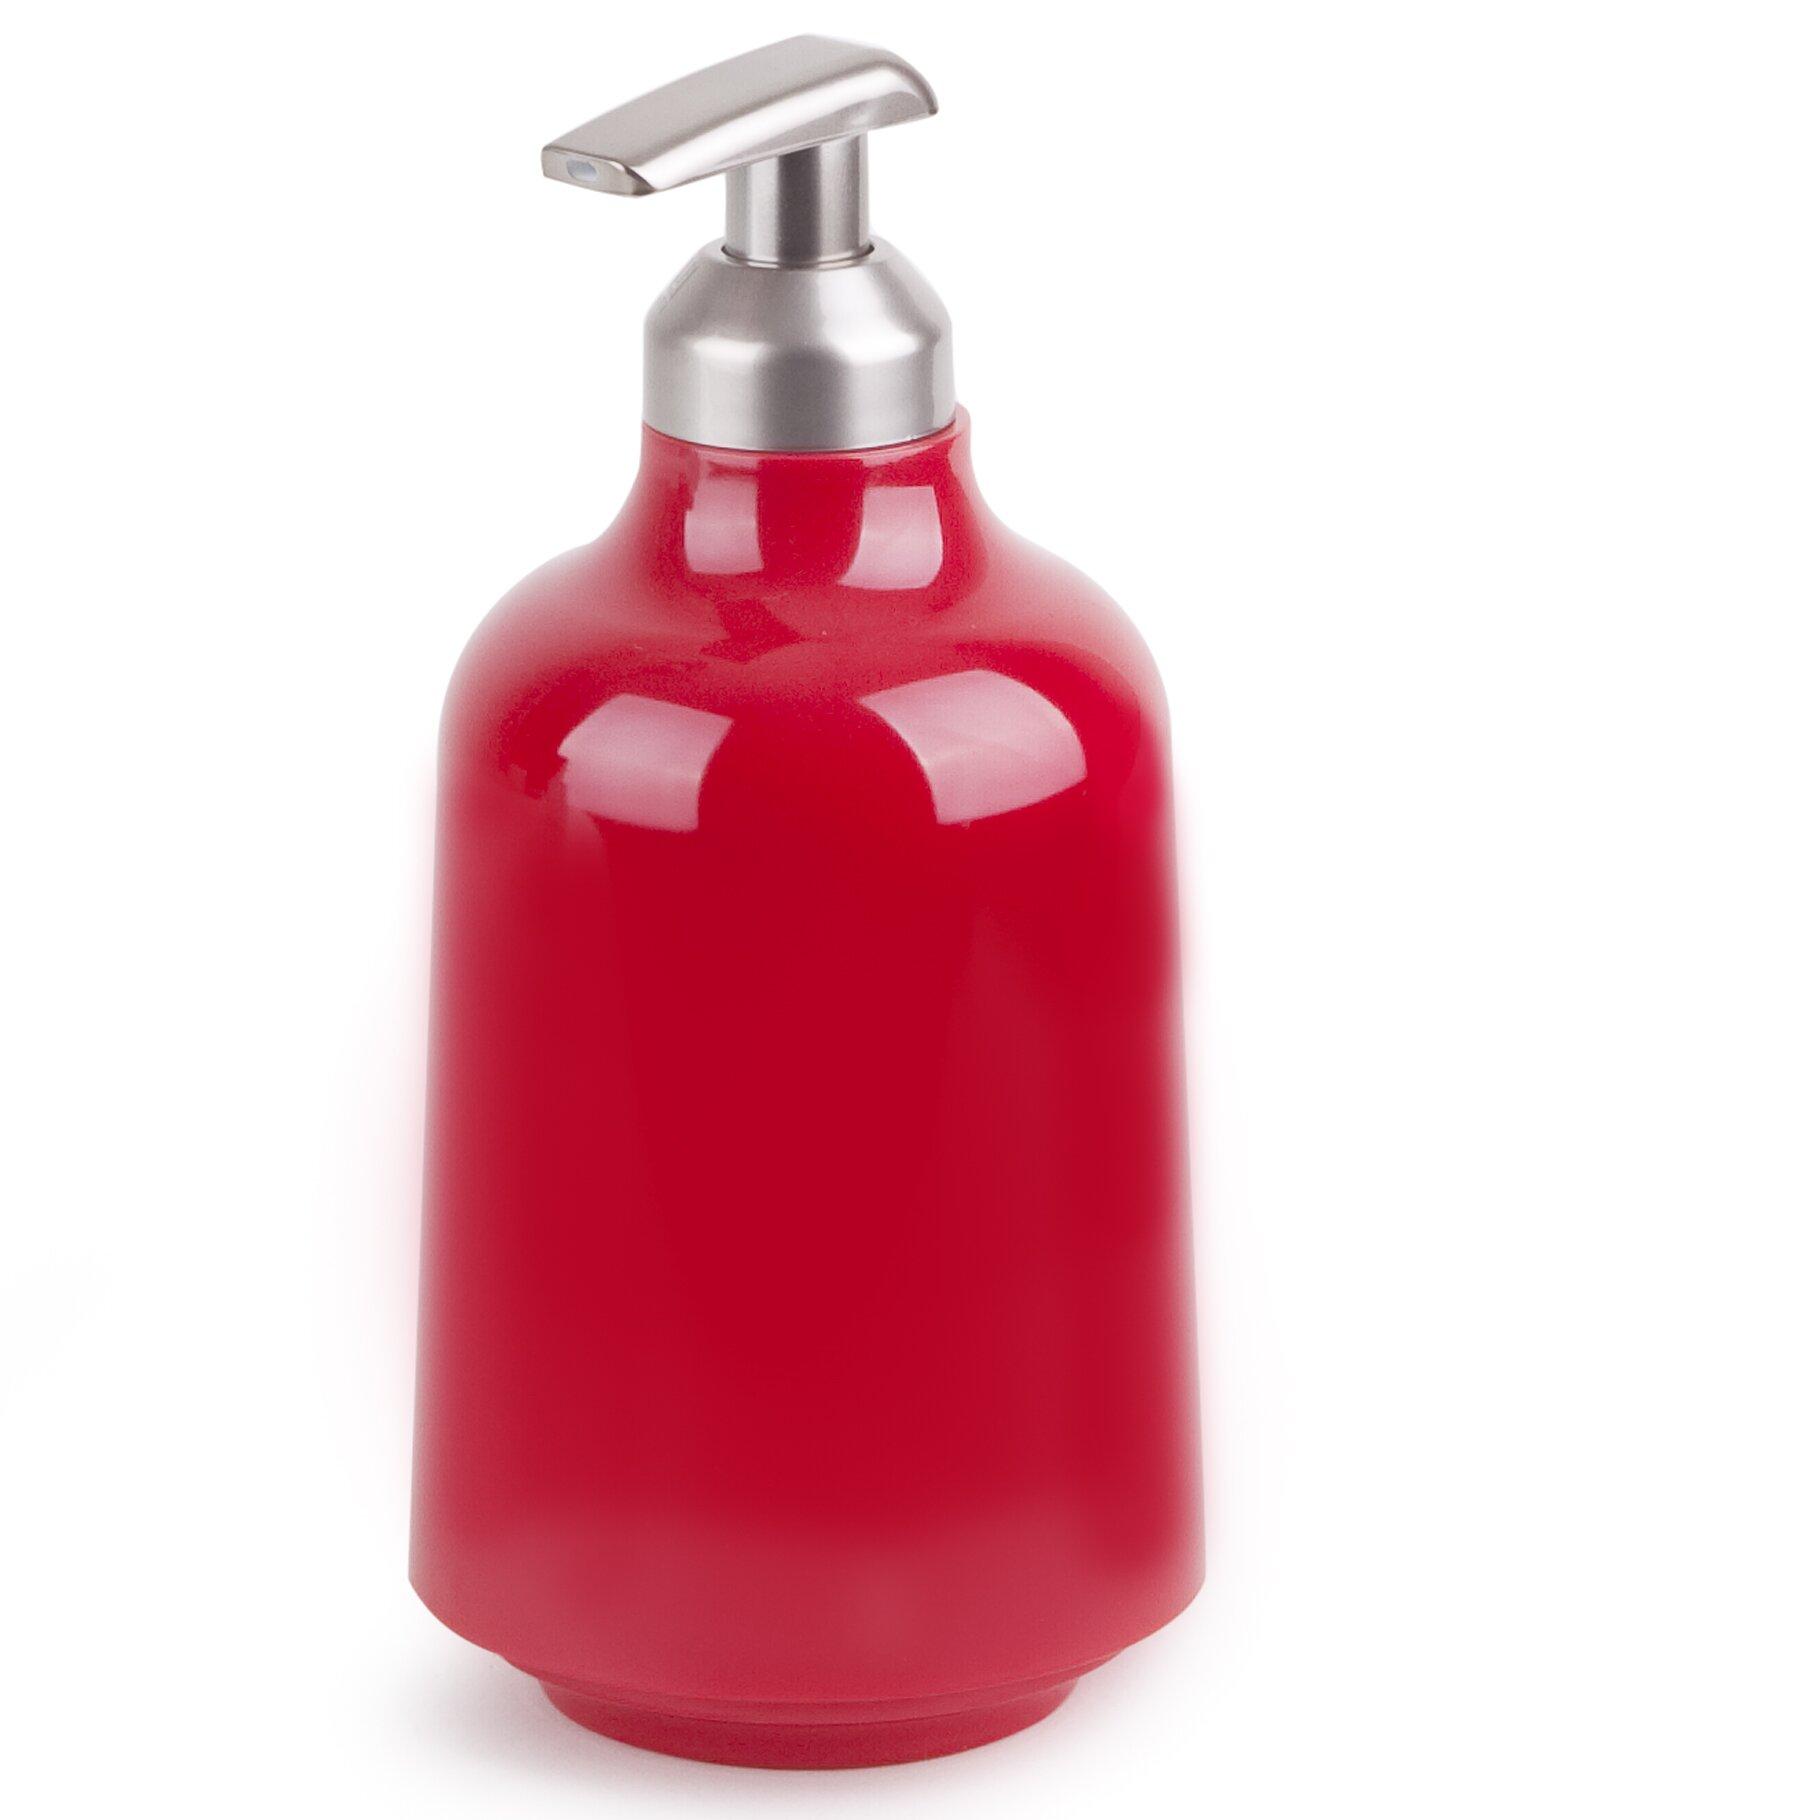 Umbra Step Bathroom Accessories Soap Dispenser Reviews Wayfair